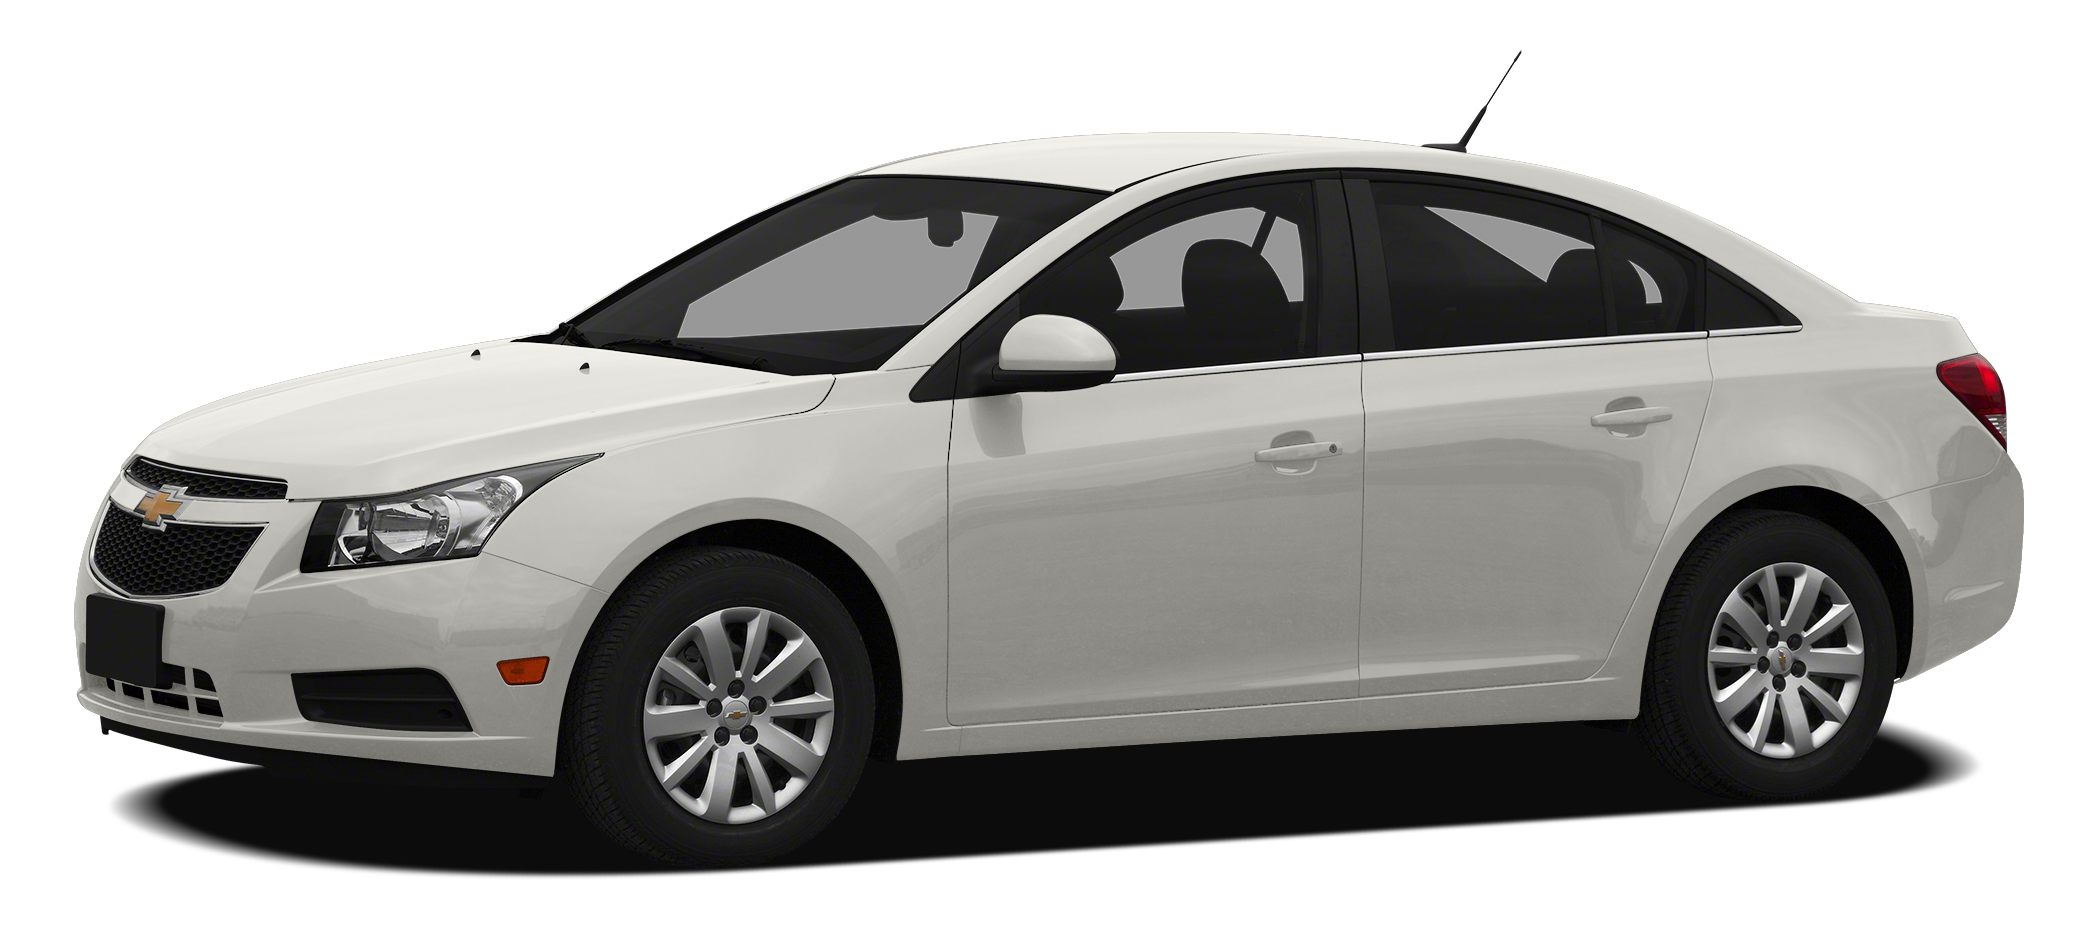 2011 Chevrolet Cruze 2LT LT w2LT trim PRICED TO MOVE 500 below NADA Retail FUEL EFFICIENT 36